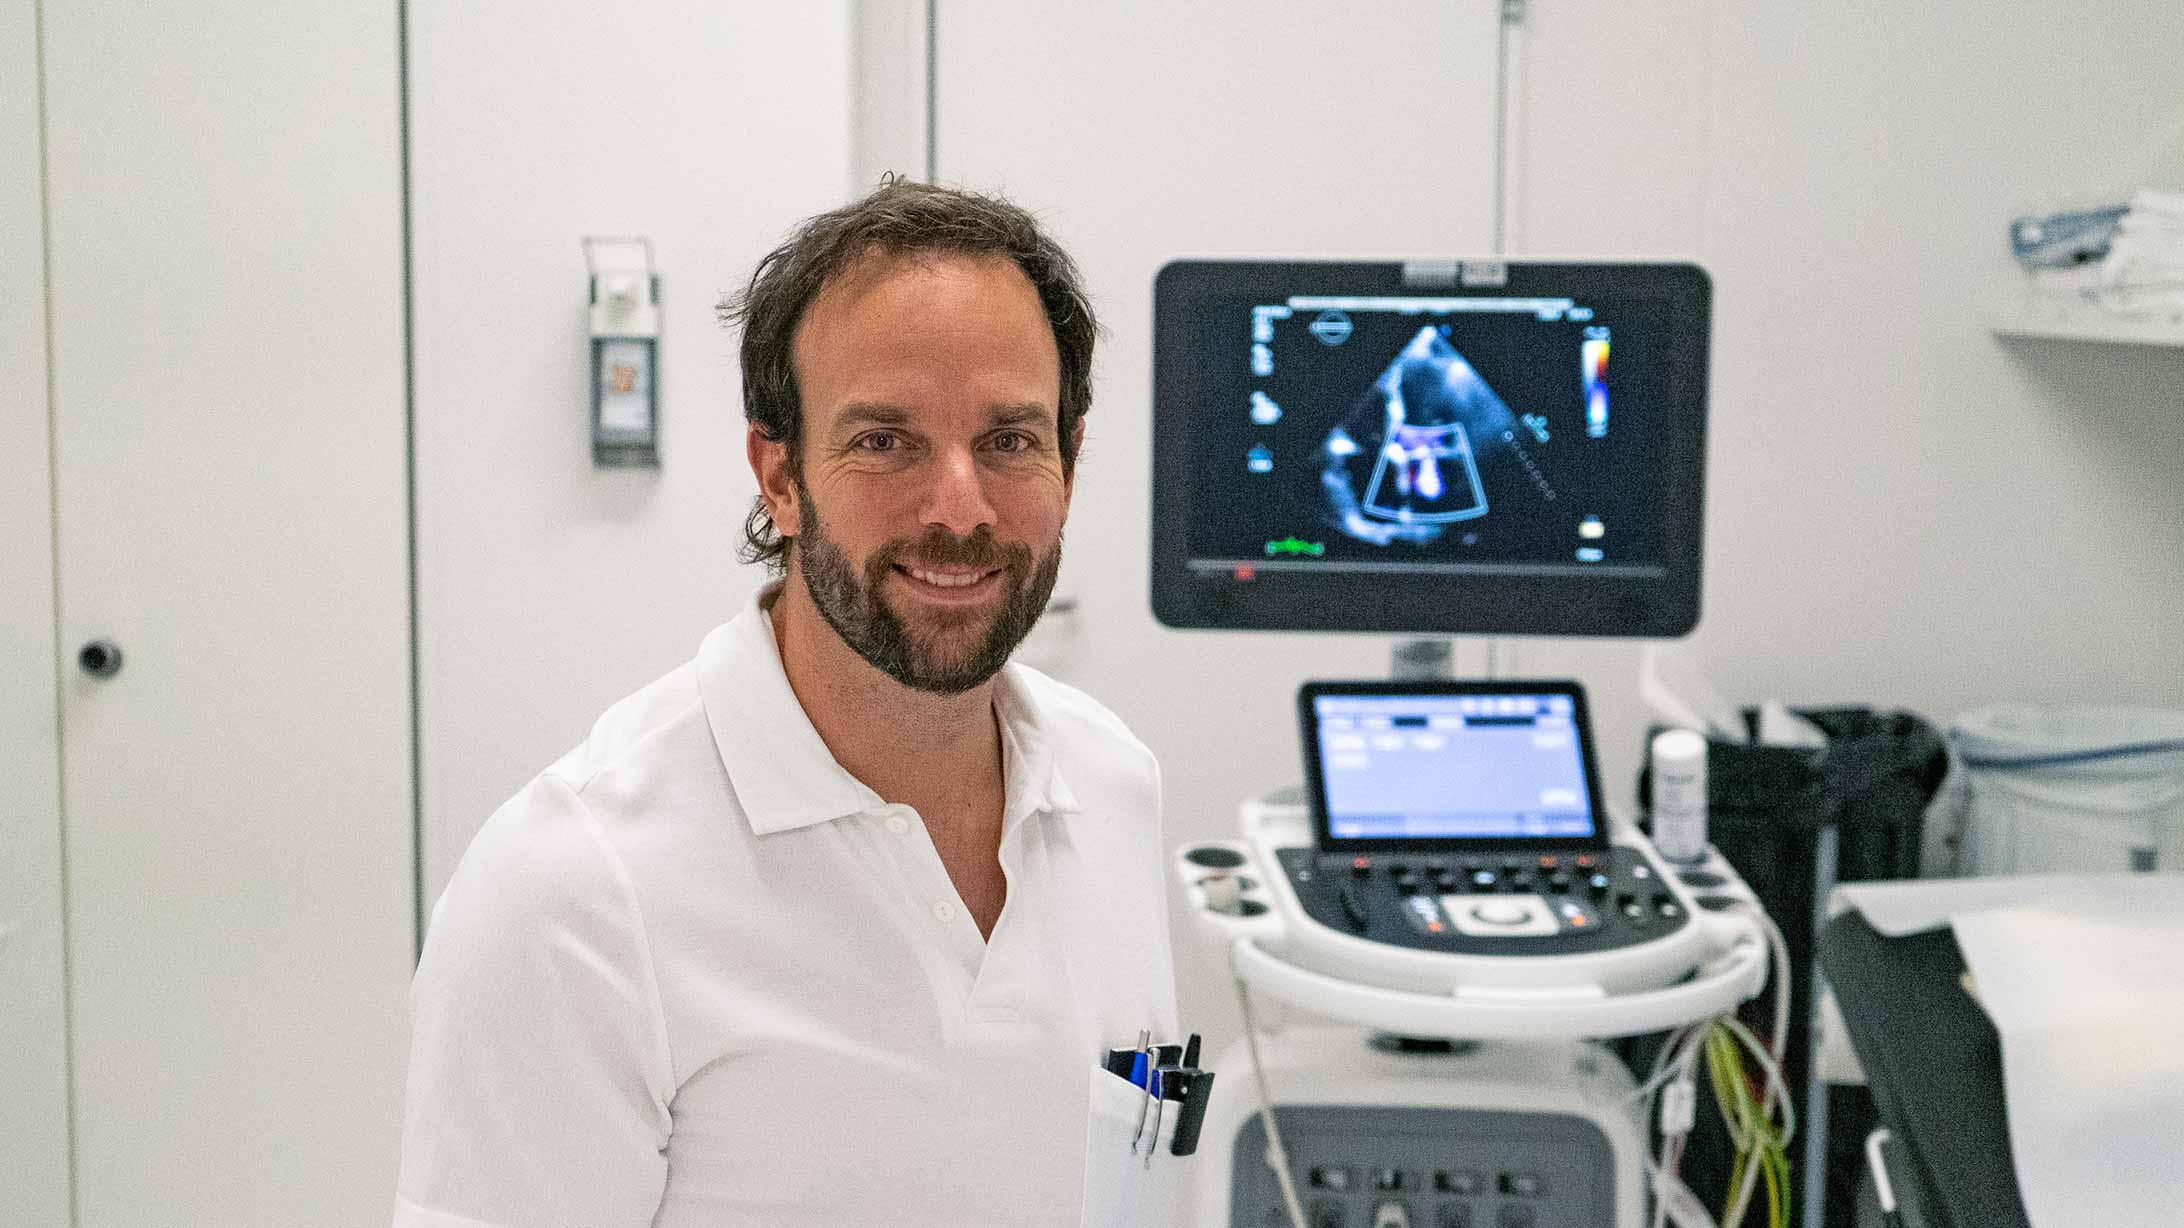 KSB-Kardiologe Pascal Köpfli